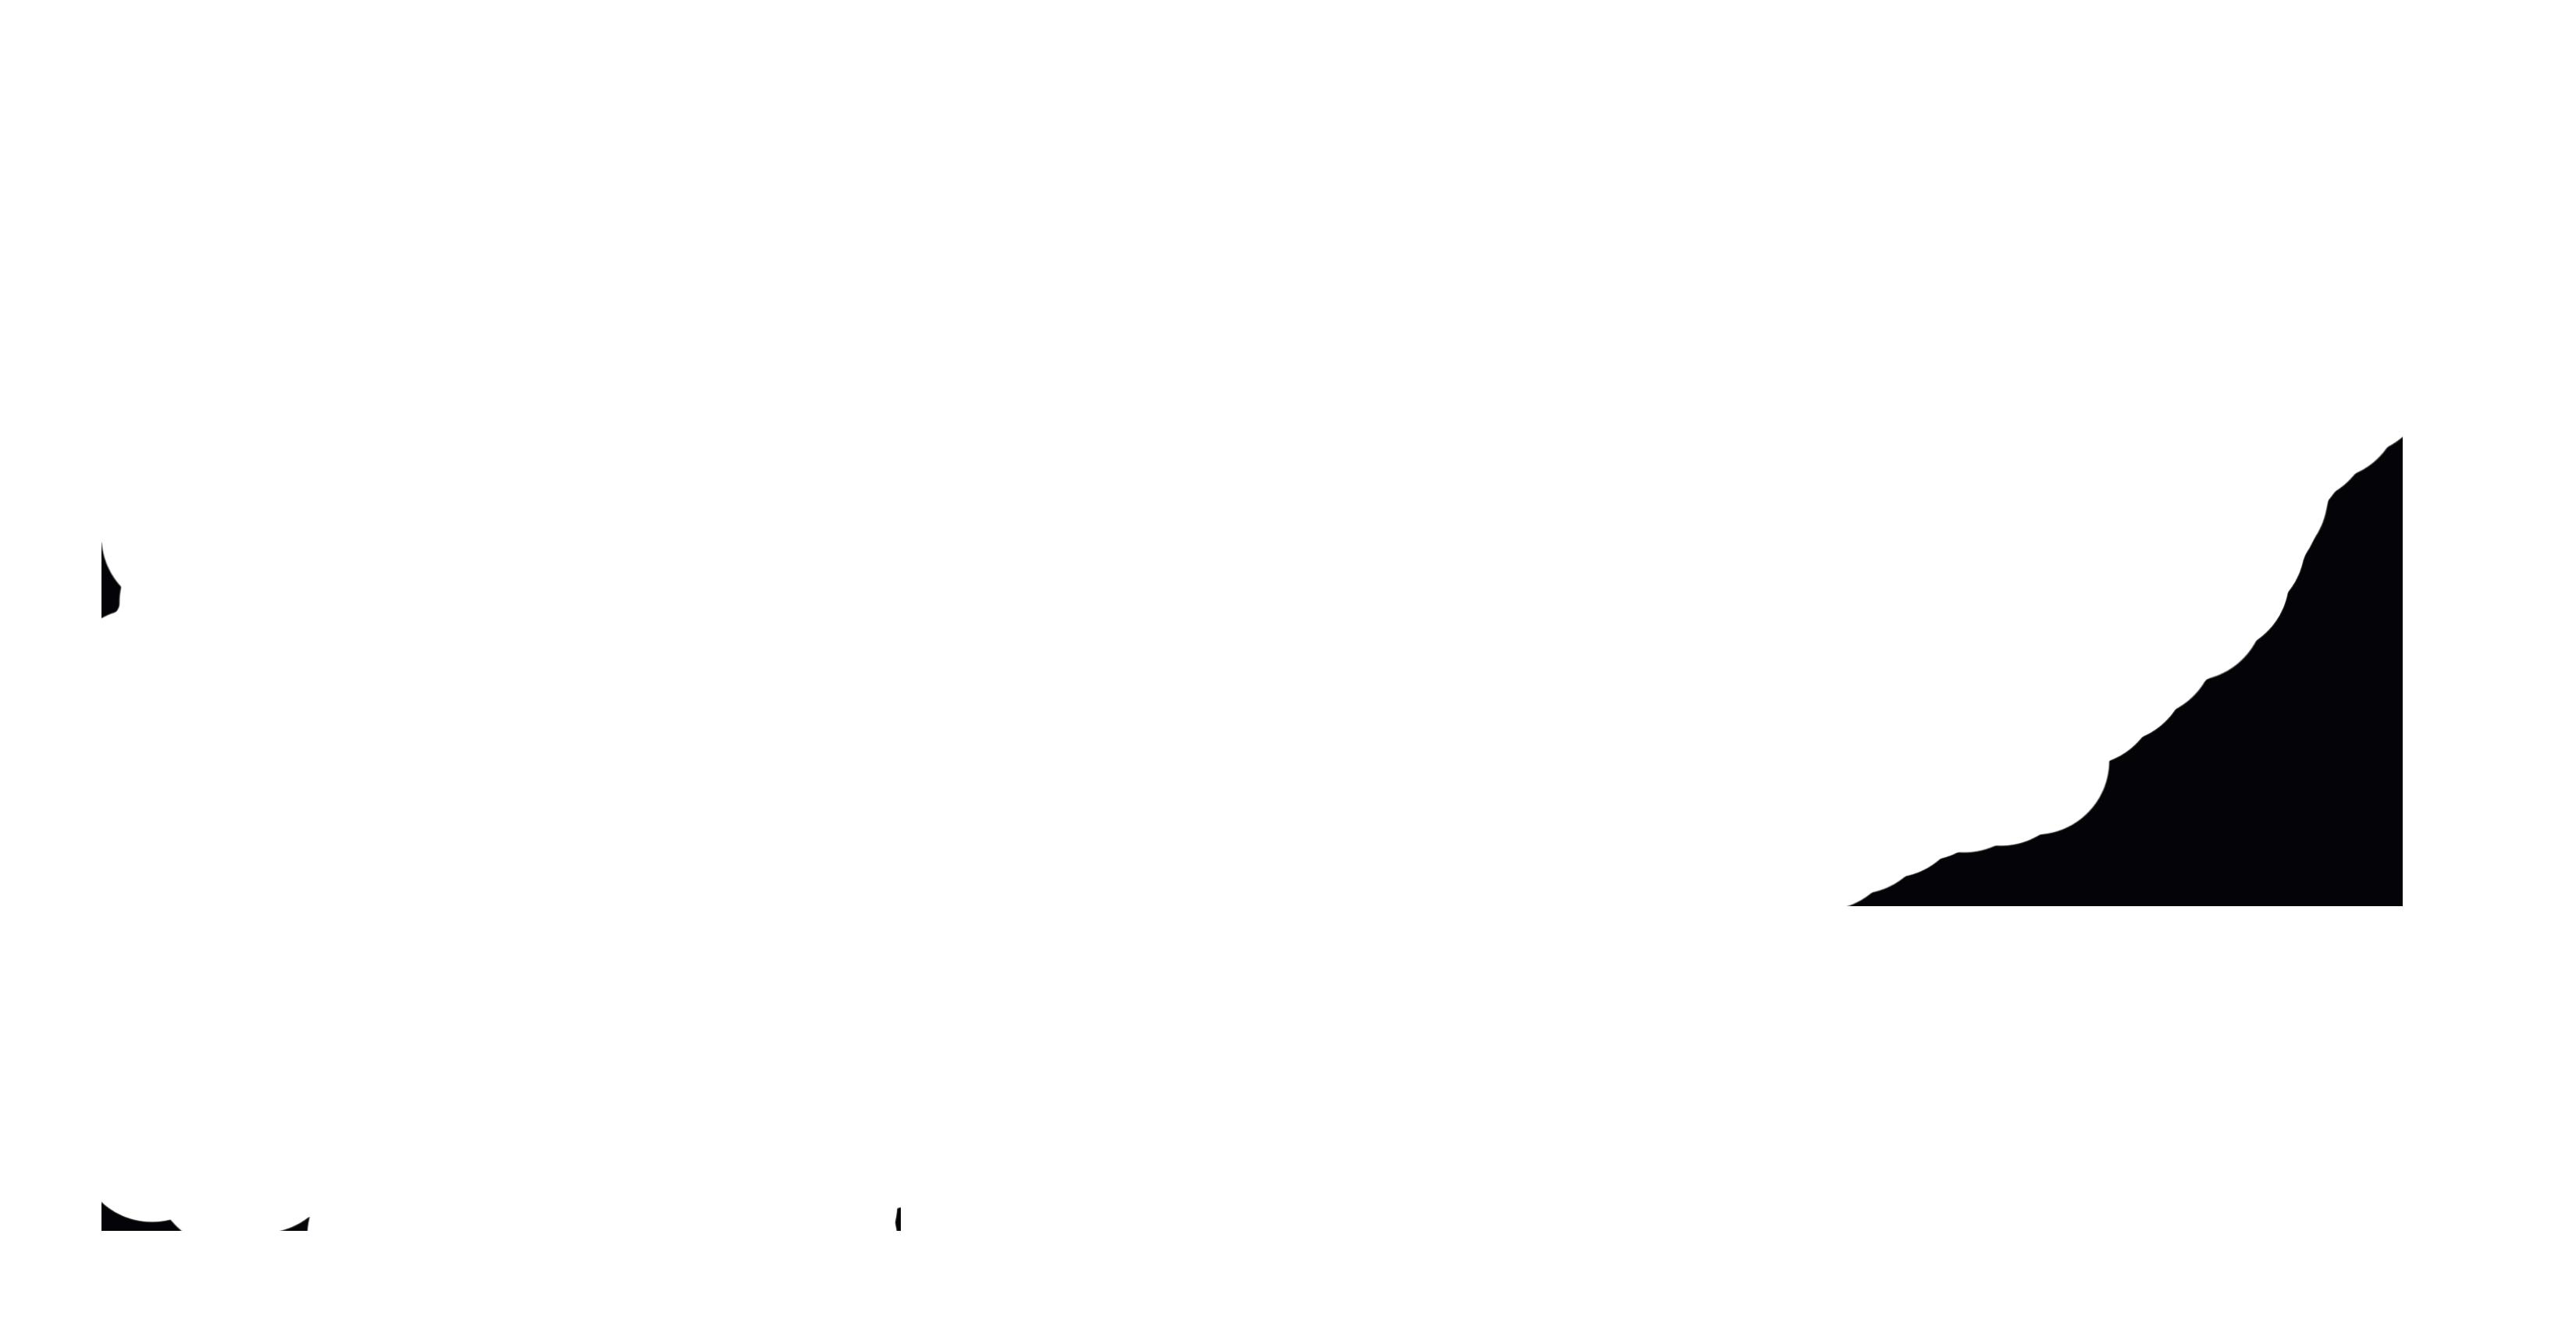 Kevin Knight